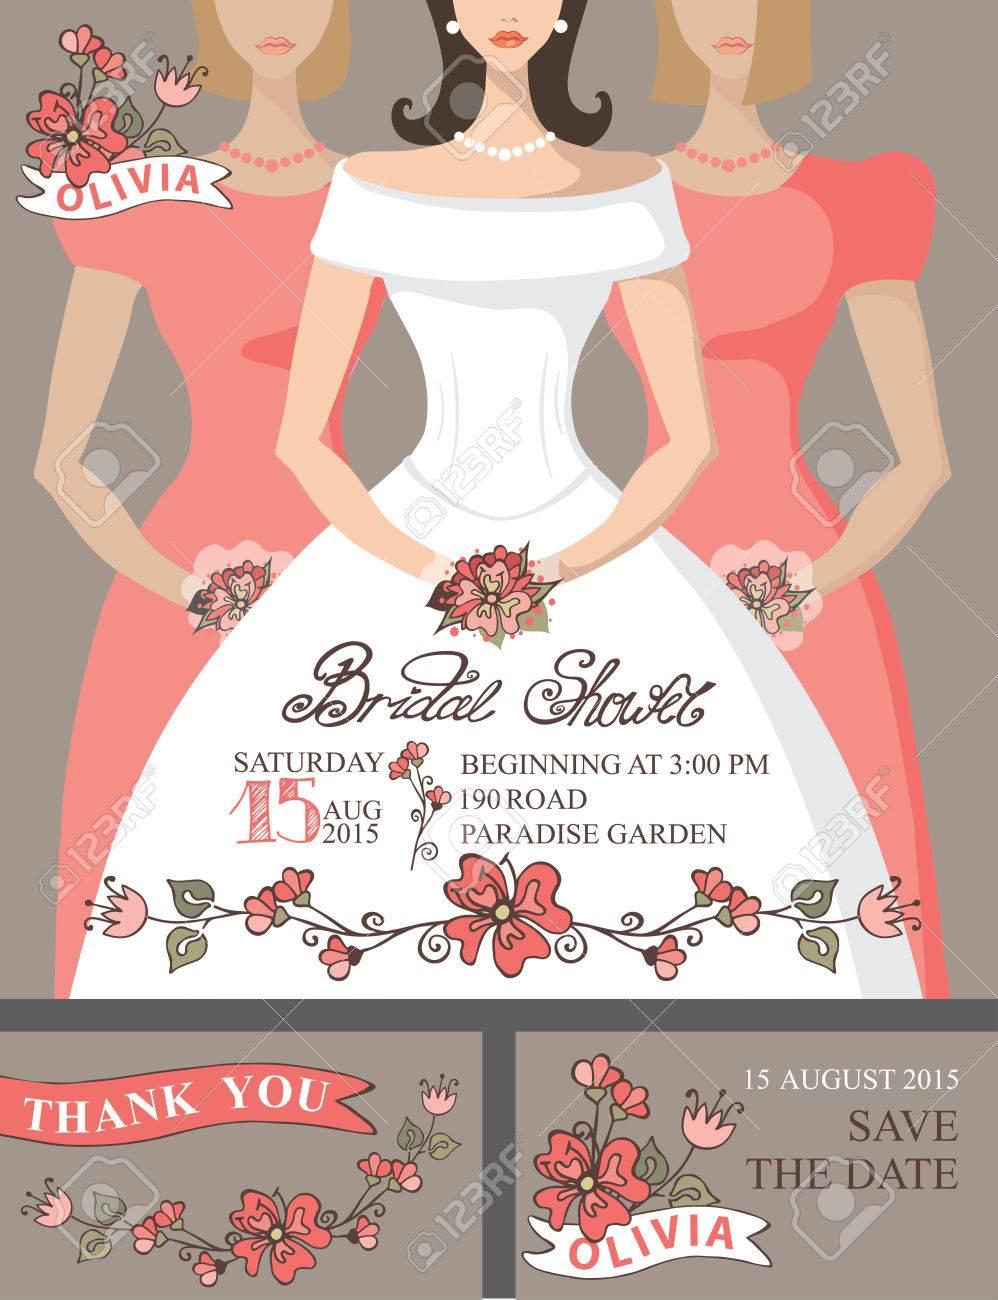 bridal shower invitation setbridebridesmaidscute floral decor stock vector 41512922